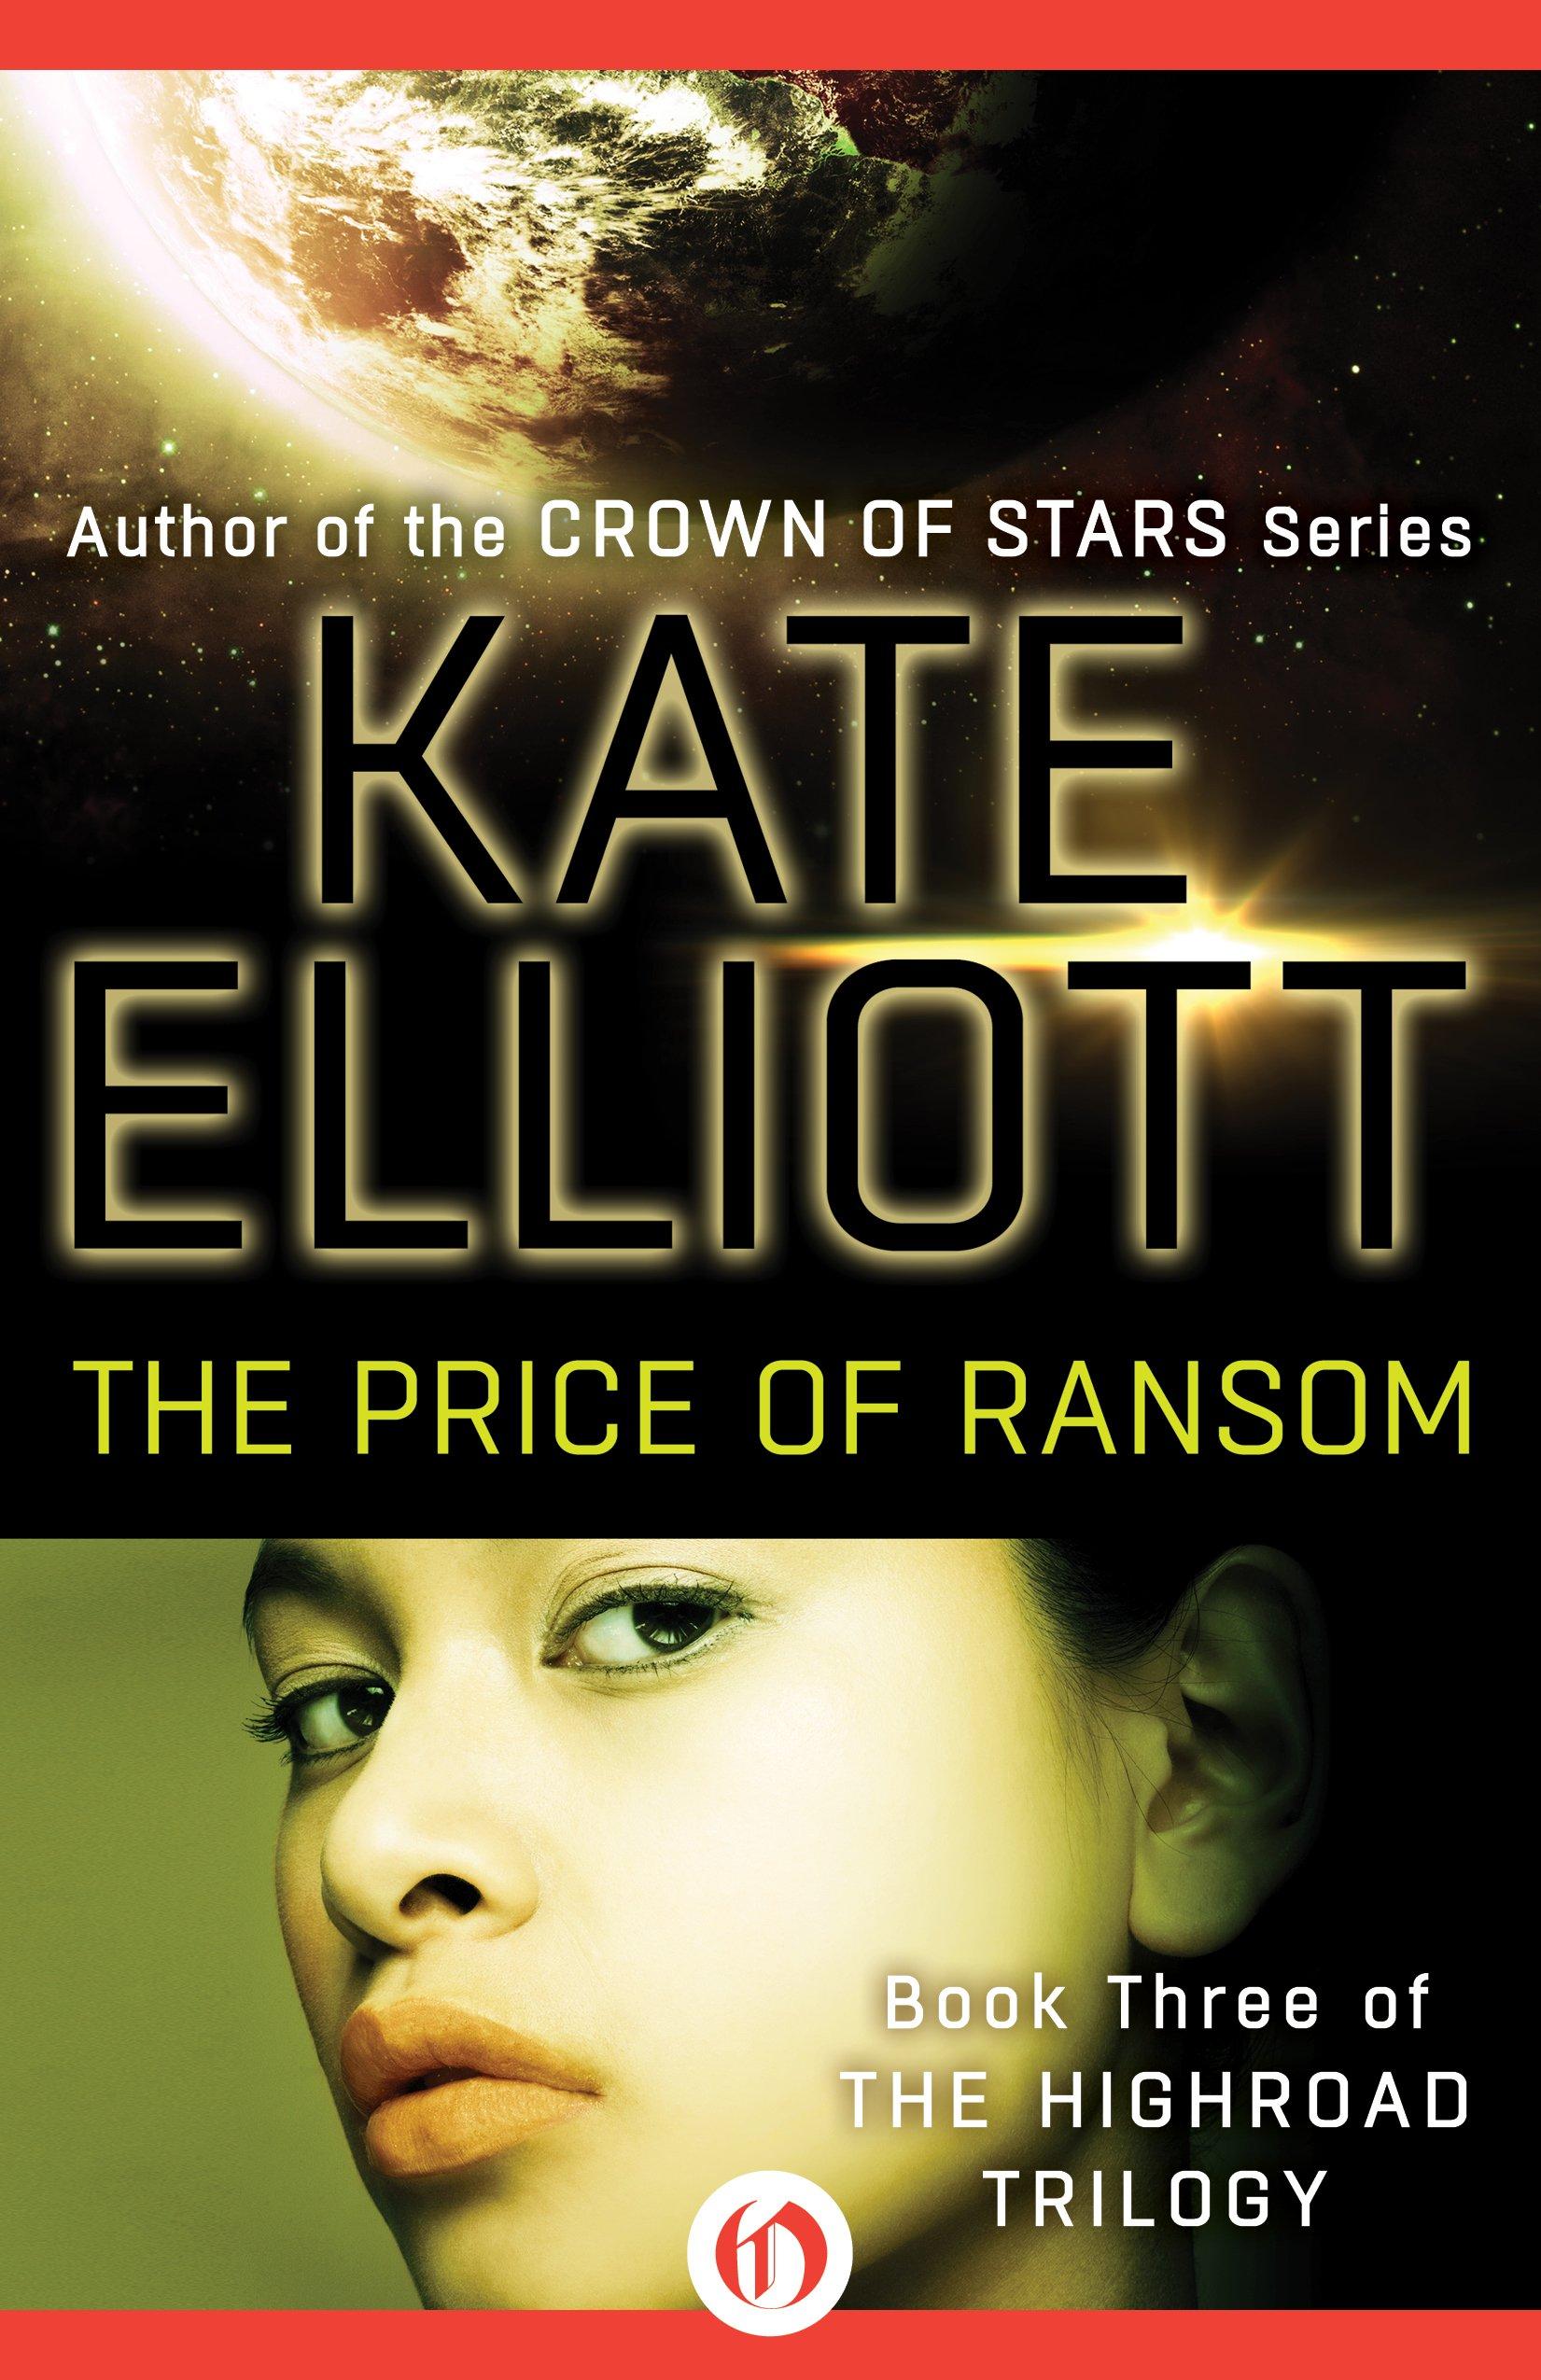 Price of Ransom